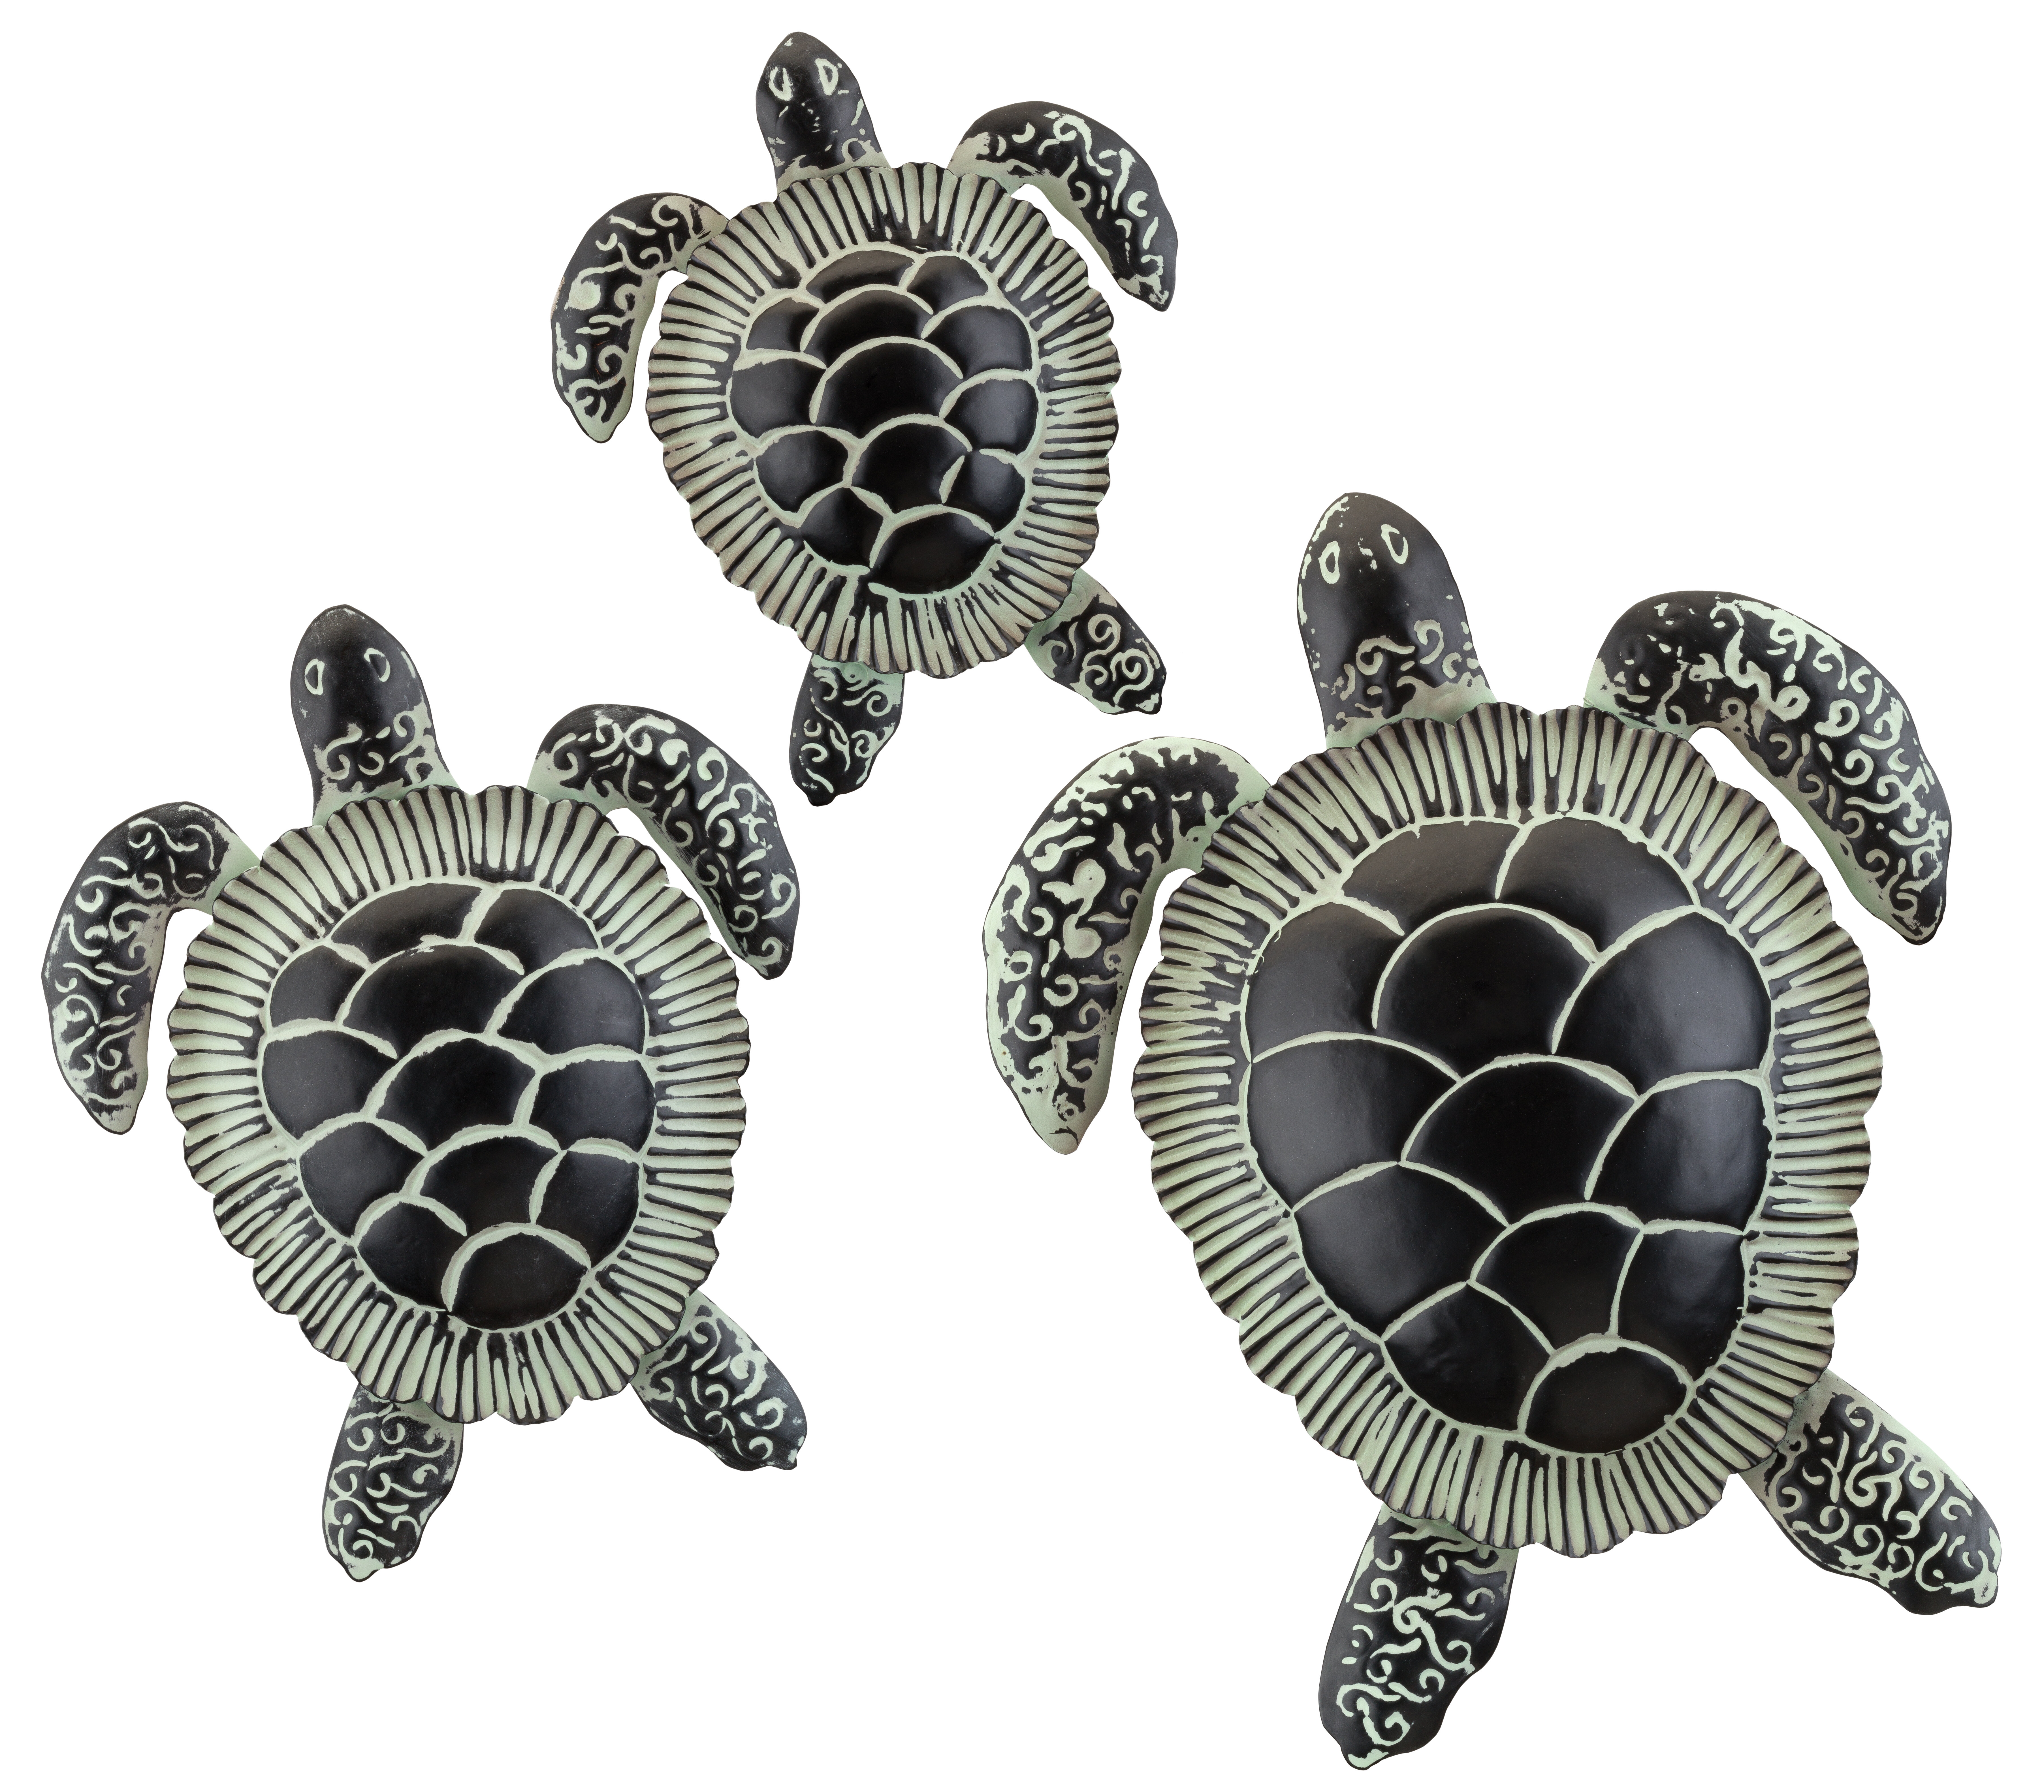 3 Piece Sea Turtle Wall Decor Set